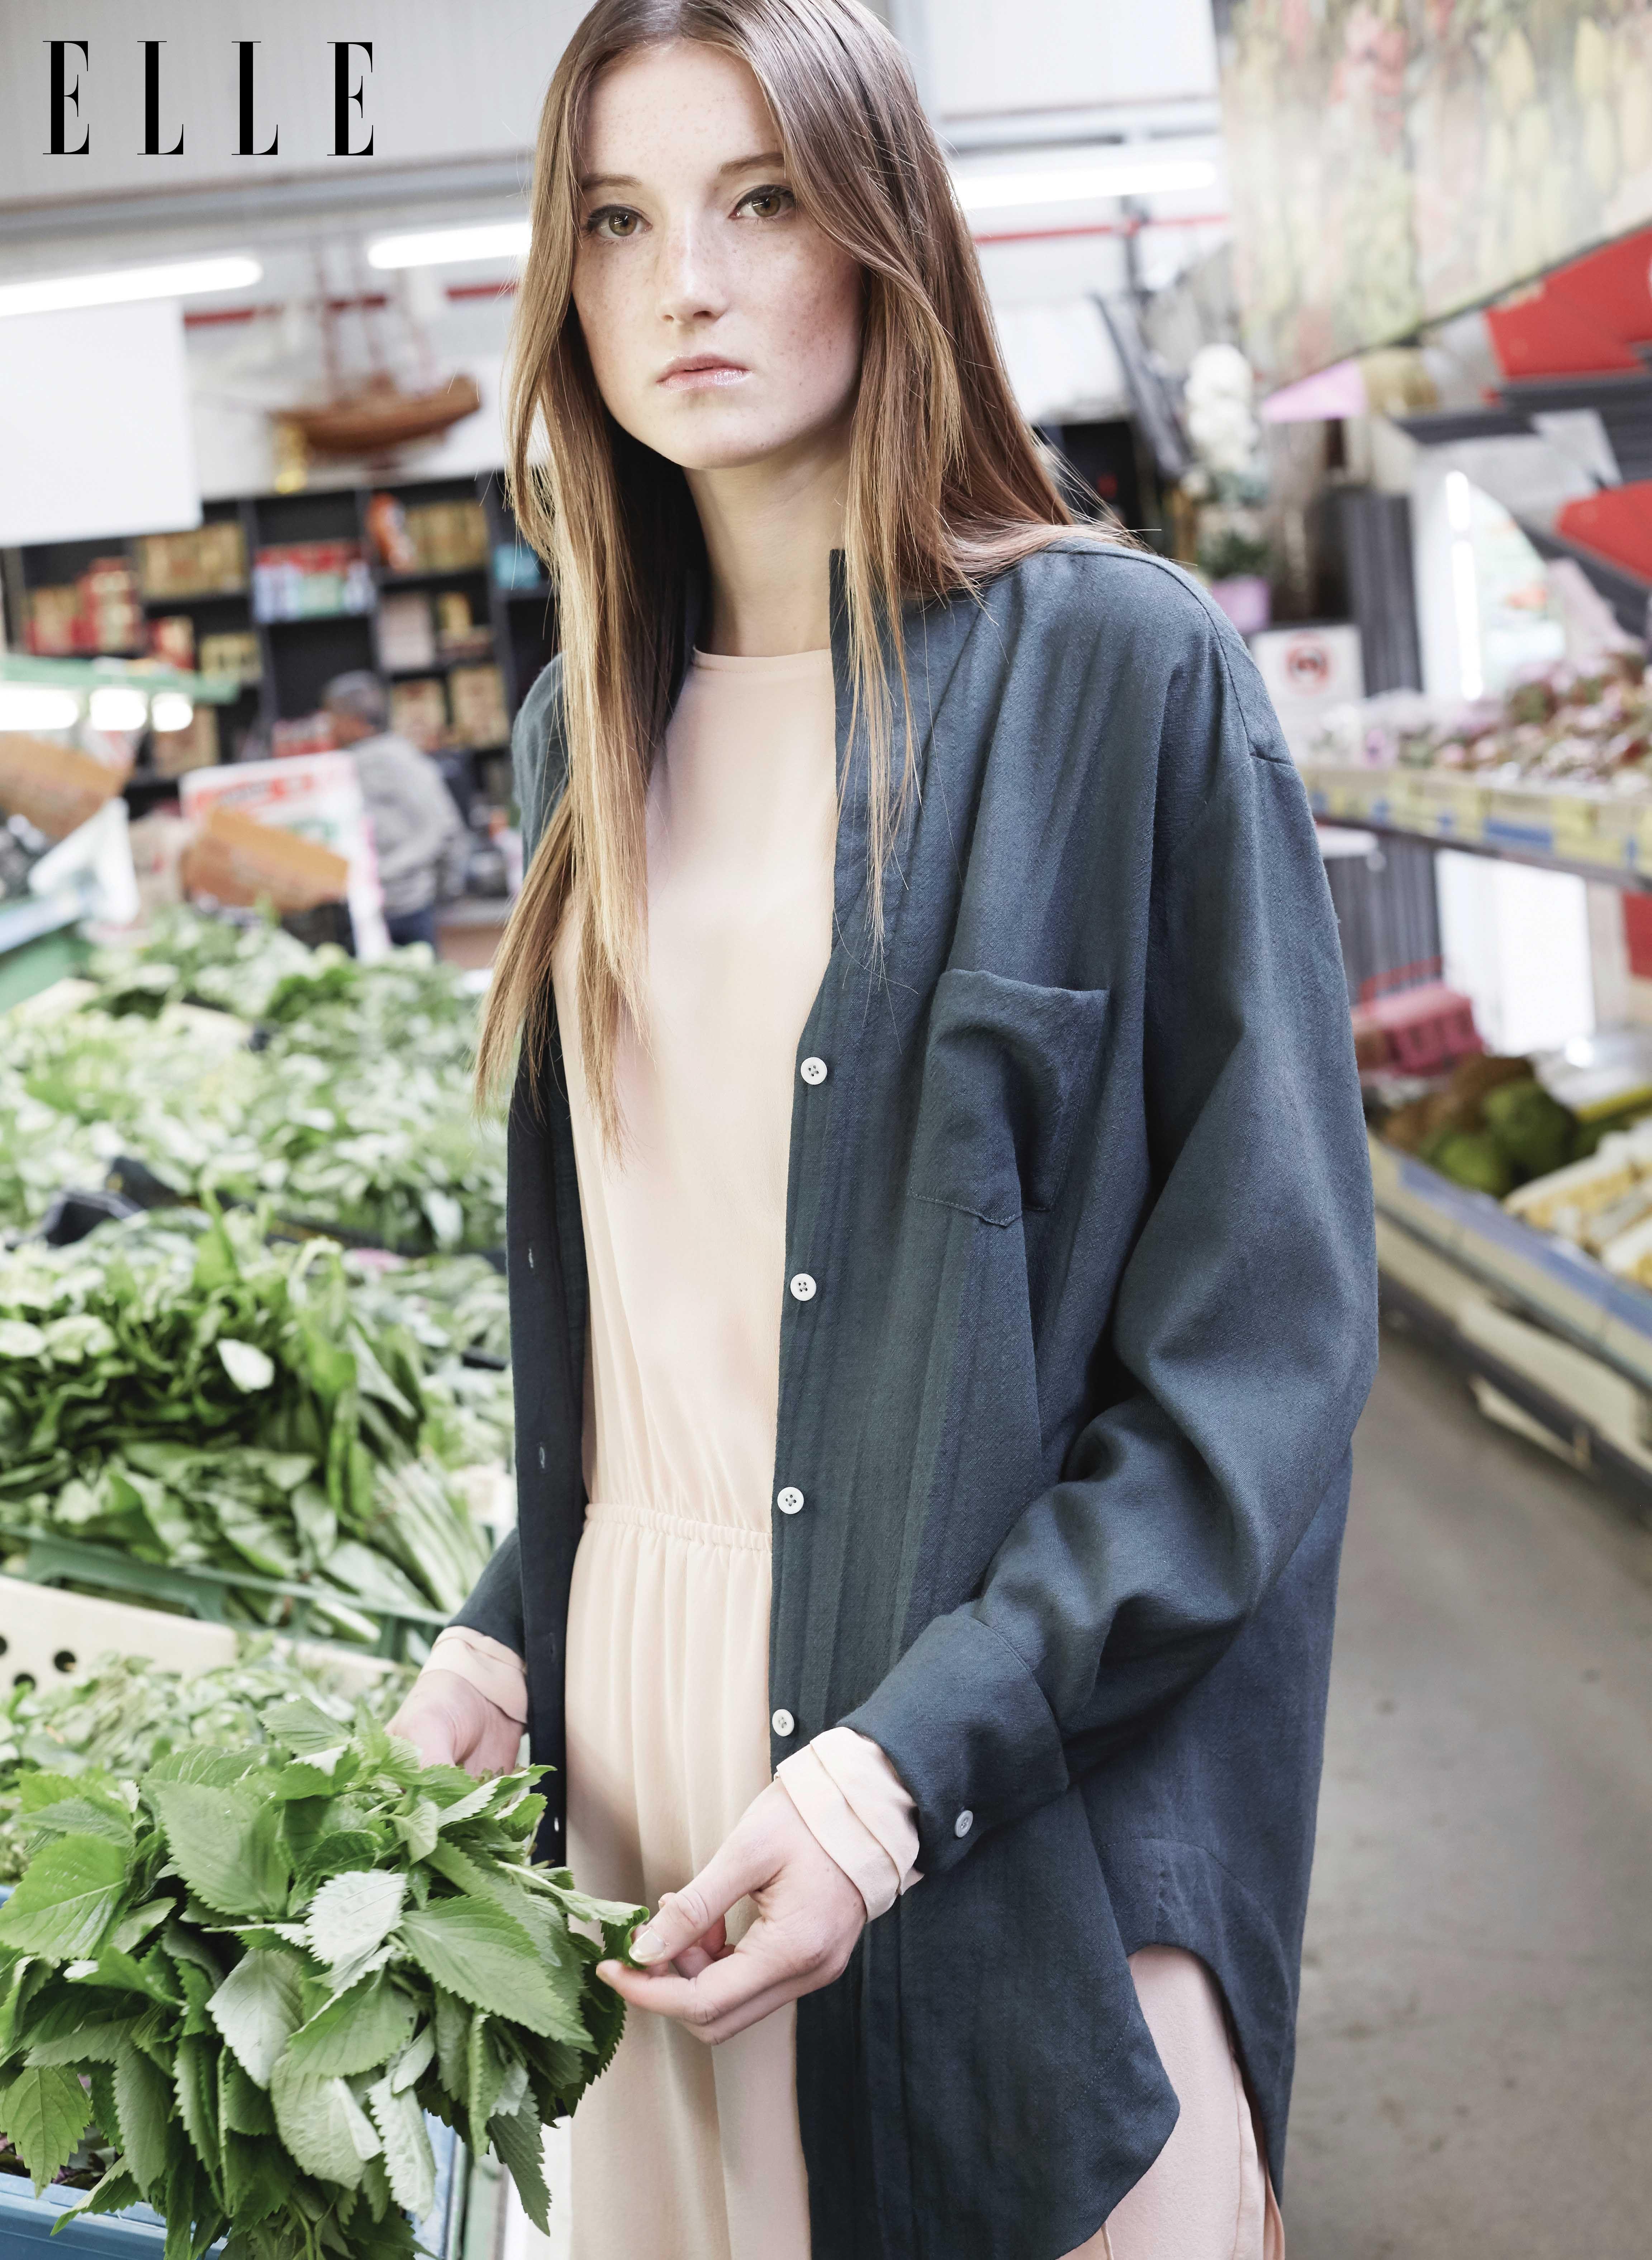 Korean flannel outfits  Đầm Hien Le Áo khoác Perret Schaad  FashionStreet style